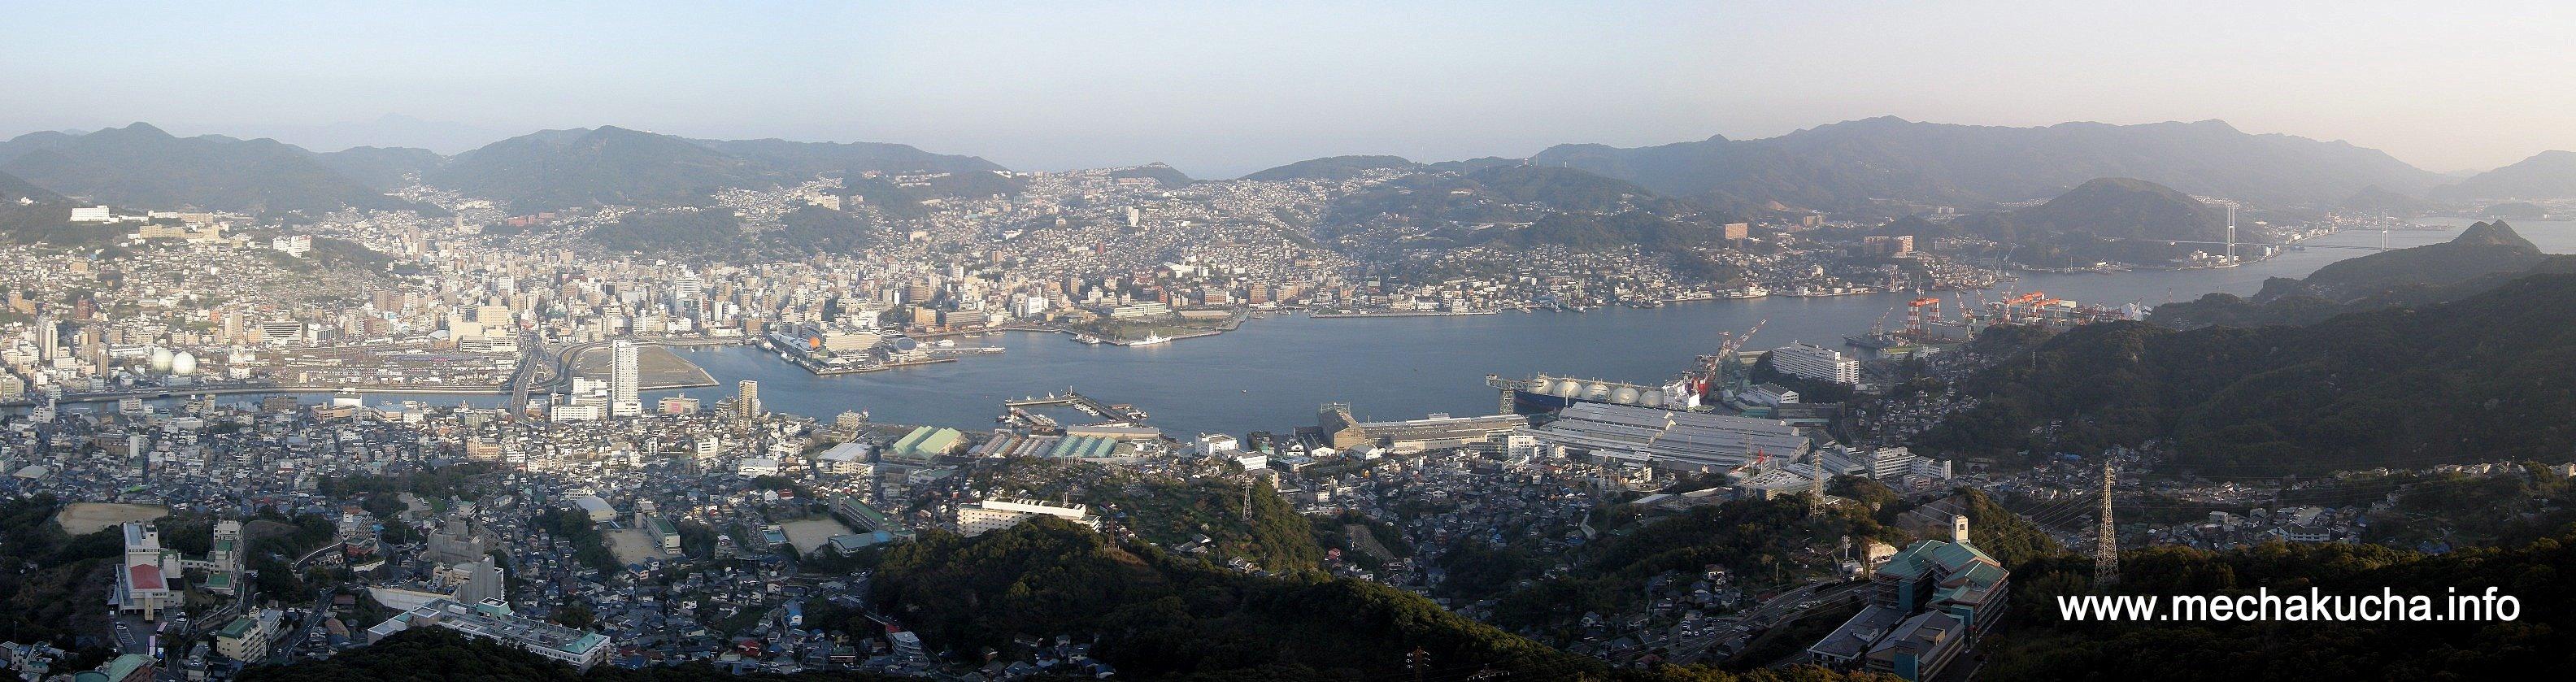 Nagasaki Panorama2